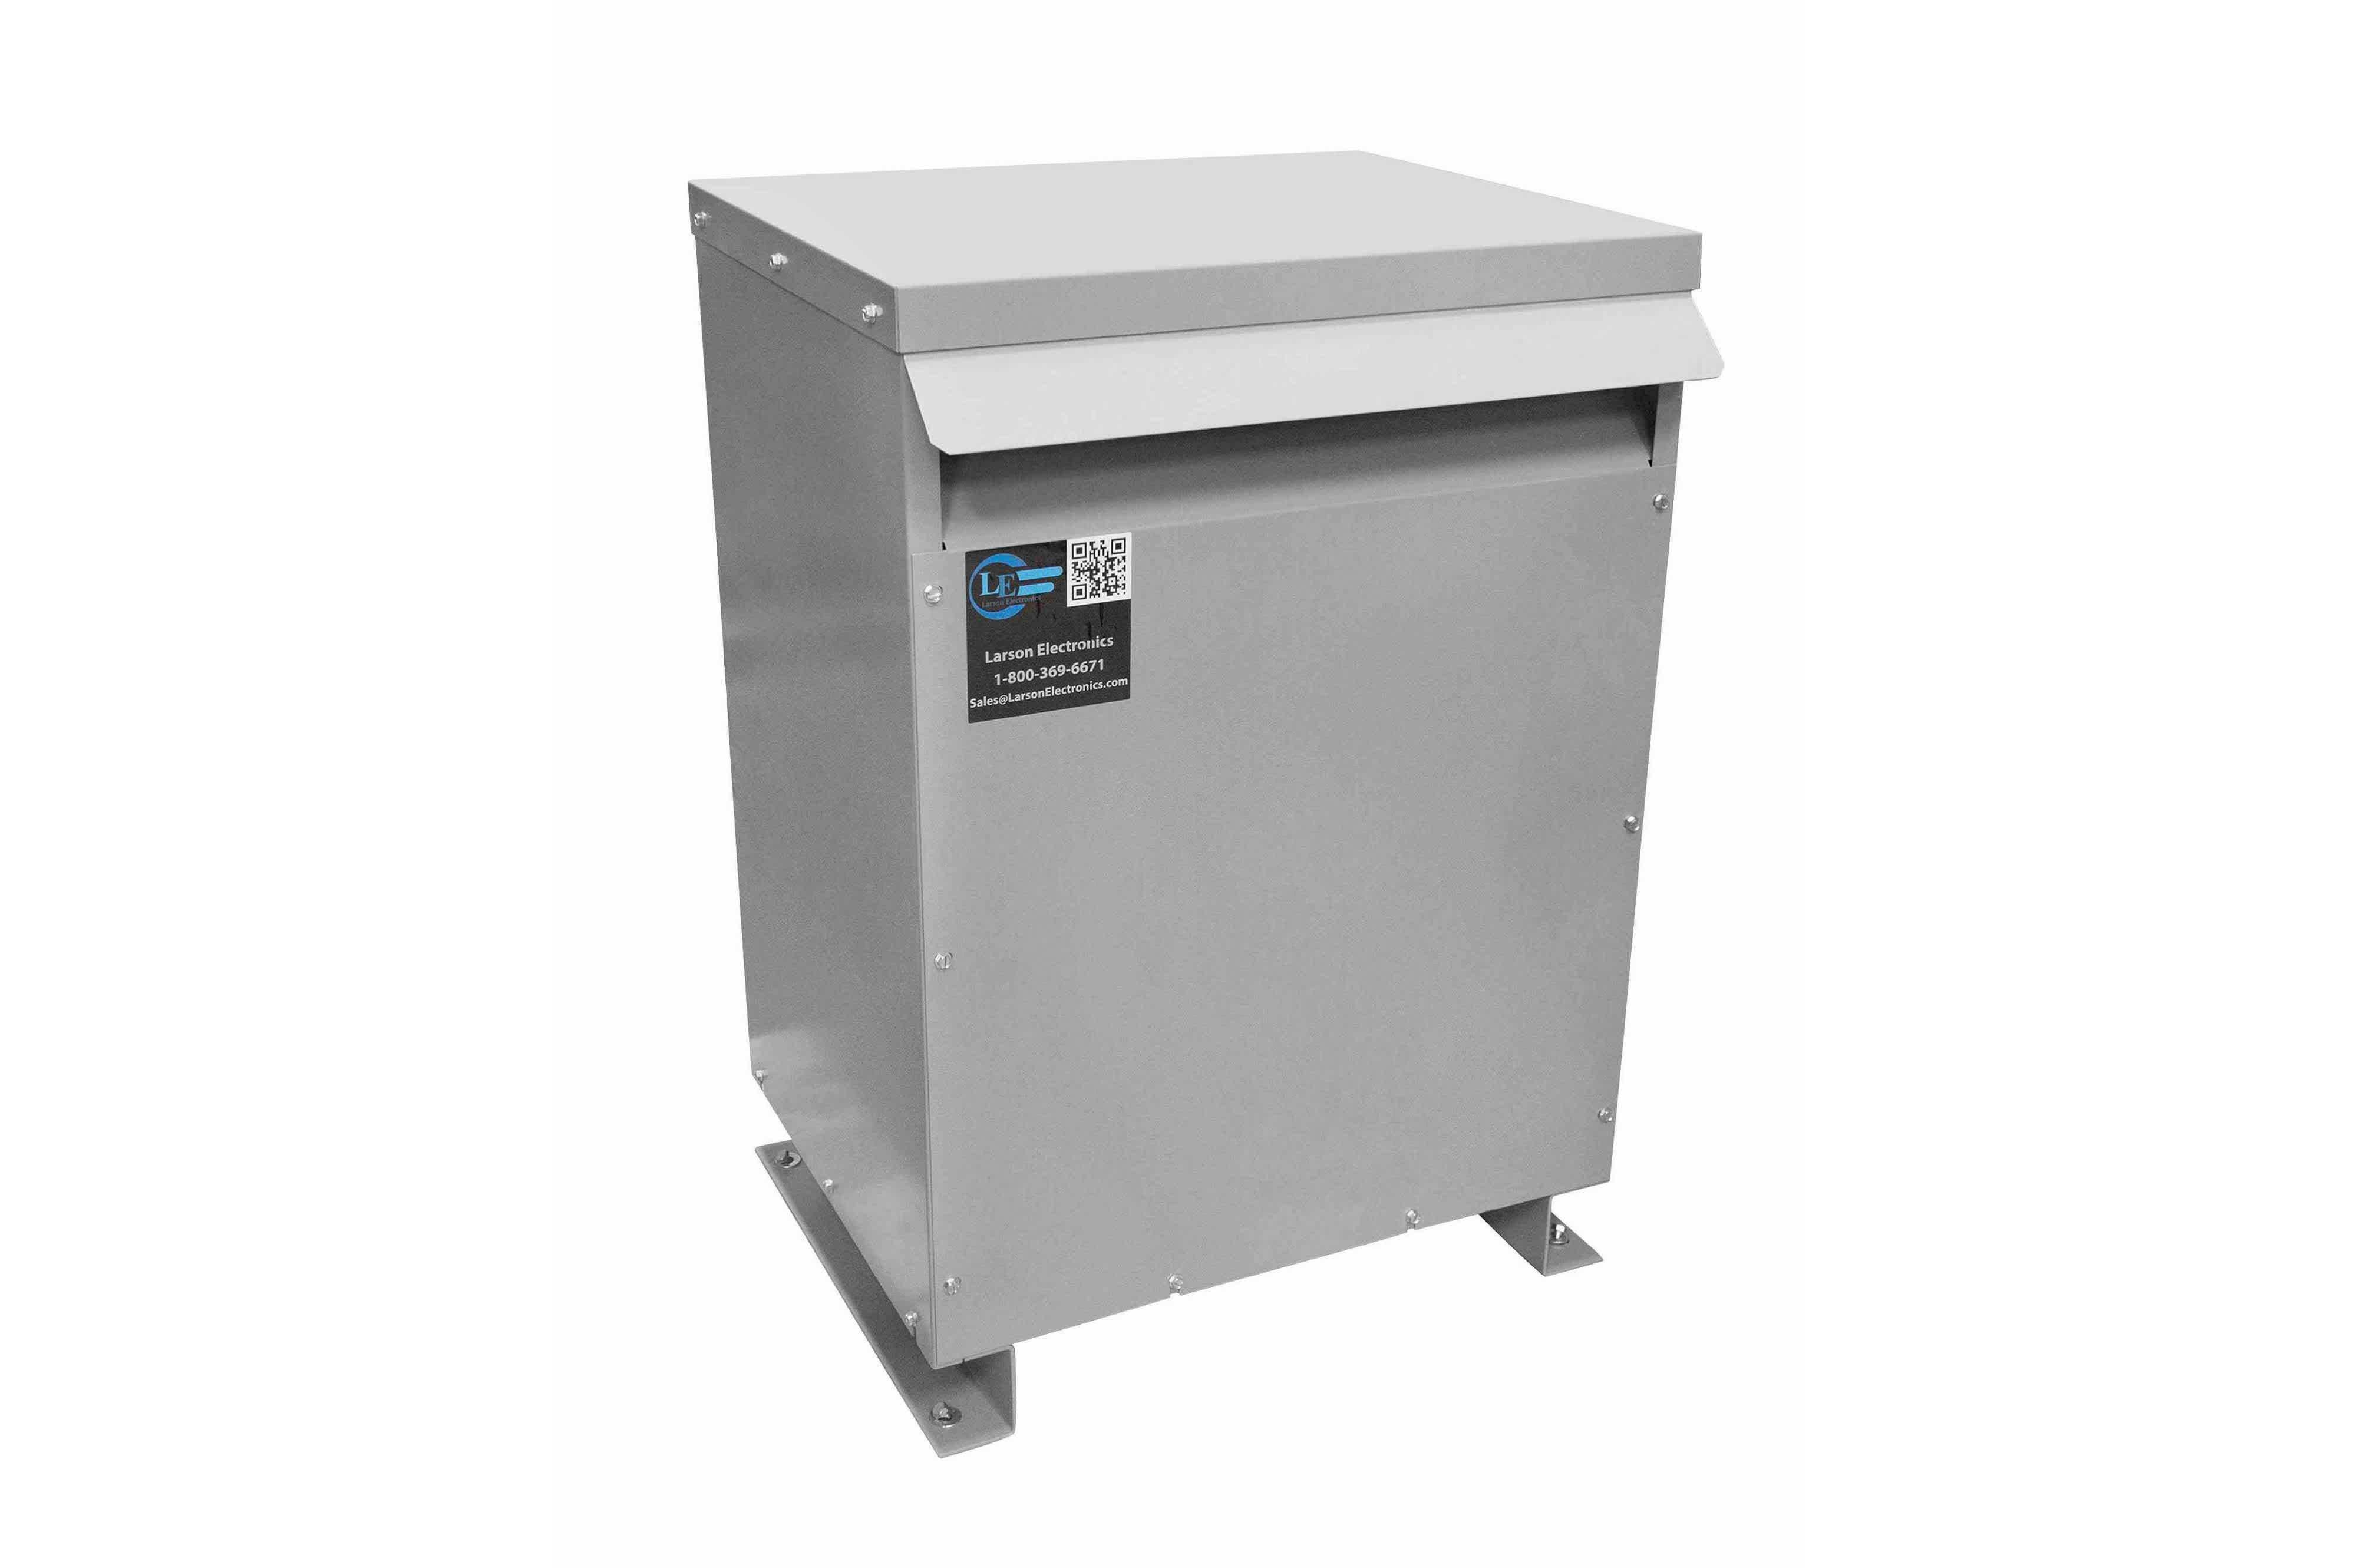 45 kVA 3PH Isolation Transformer, 575V Wye Primary, 480V Delta Secondary, N3R, Ventilated, 60 Hz